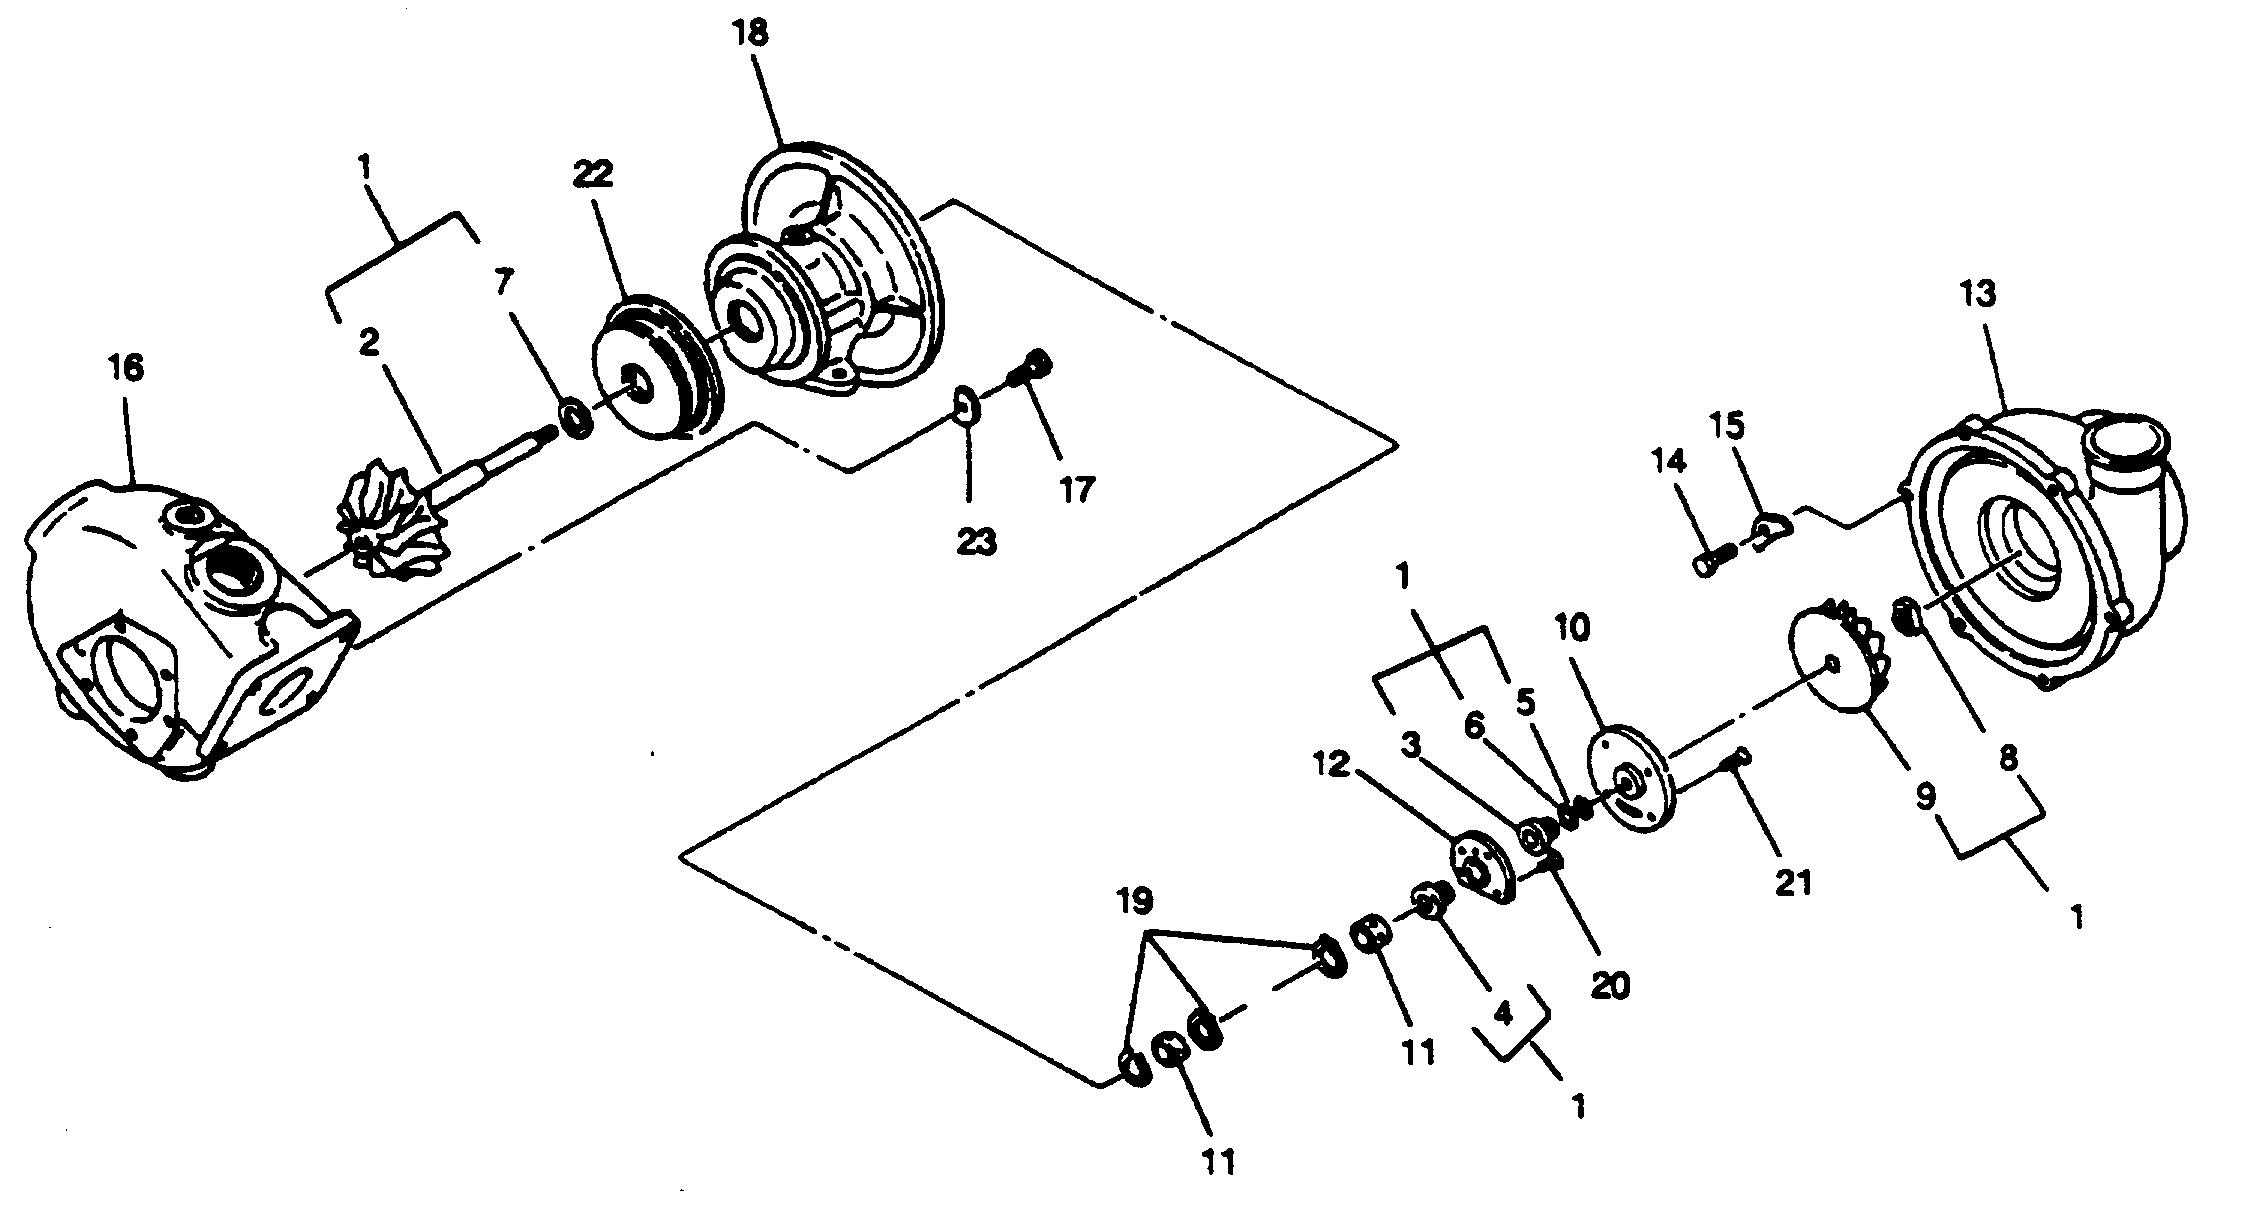 Mercruiser Wo4cti 210 Hp